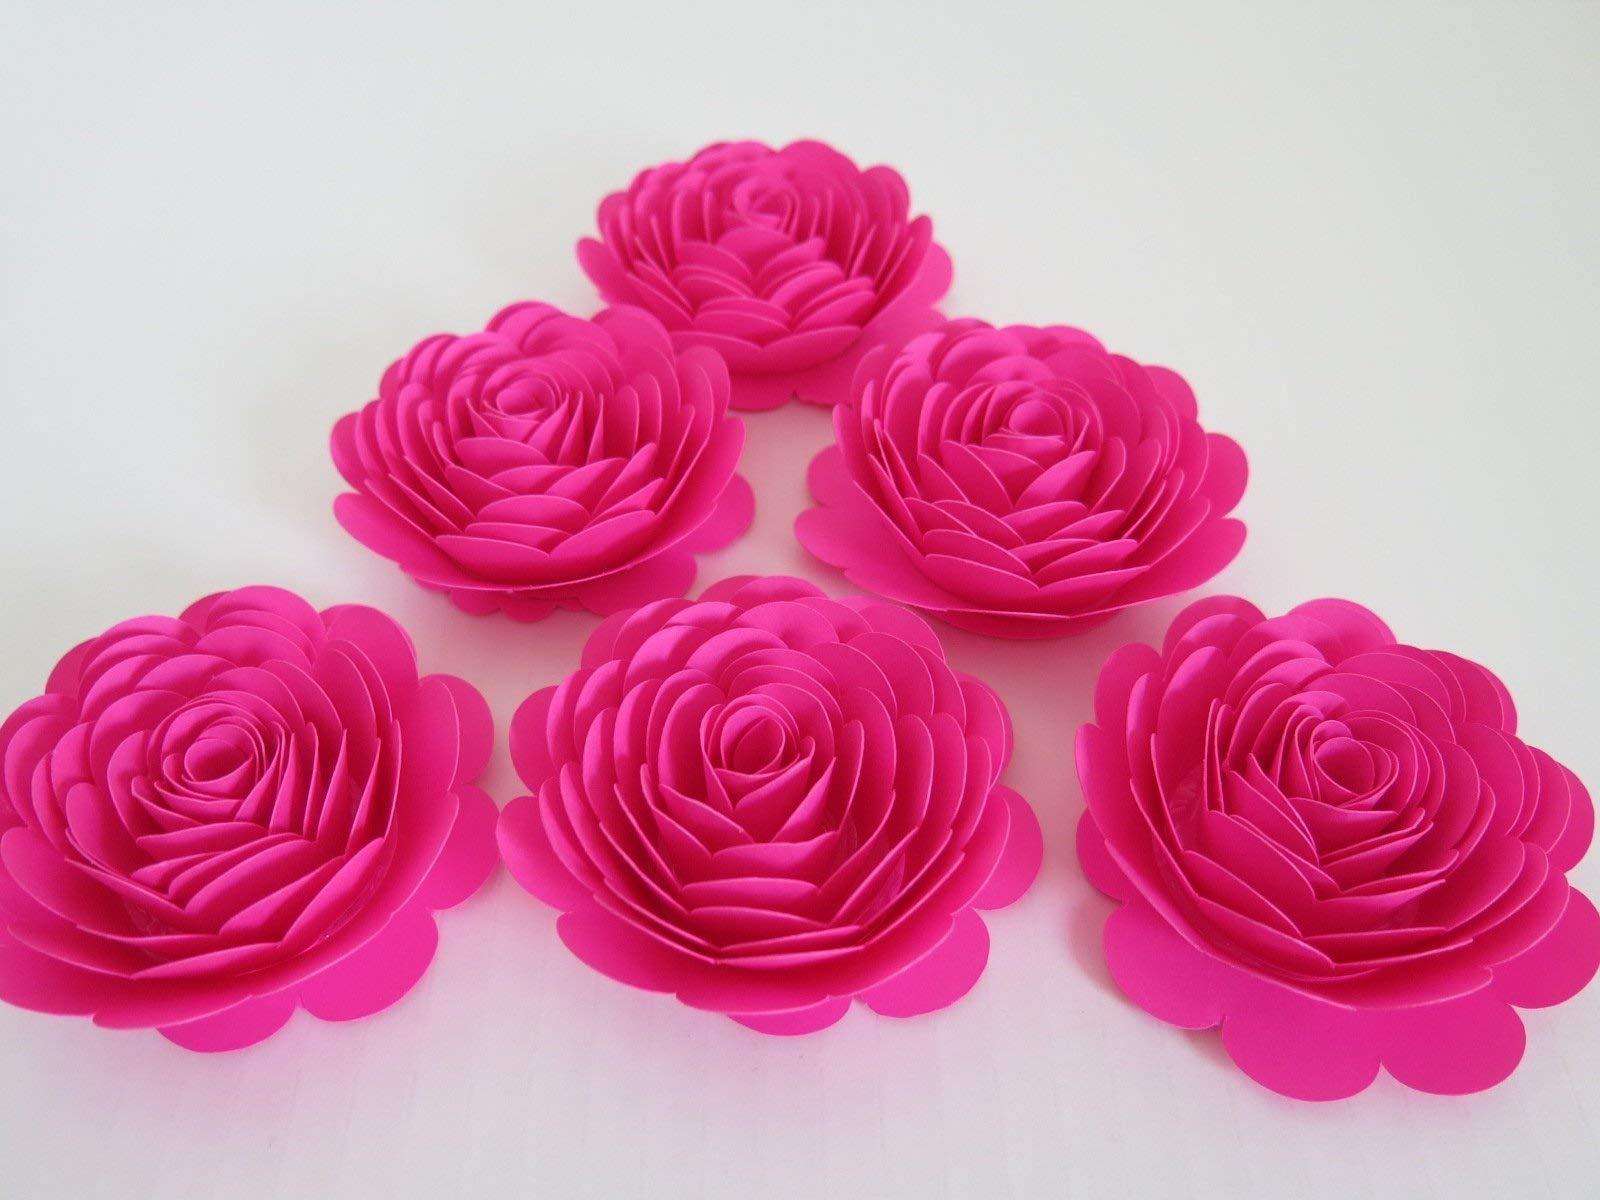 81f980e1e6b3 Fuchsia-Paper-Flowers-3-Hot-Pink-Roses-Set-